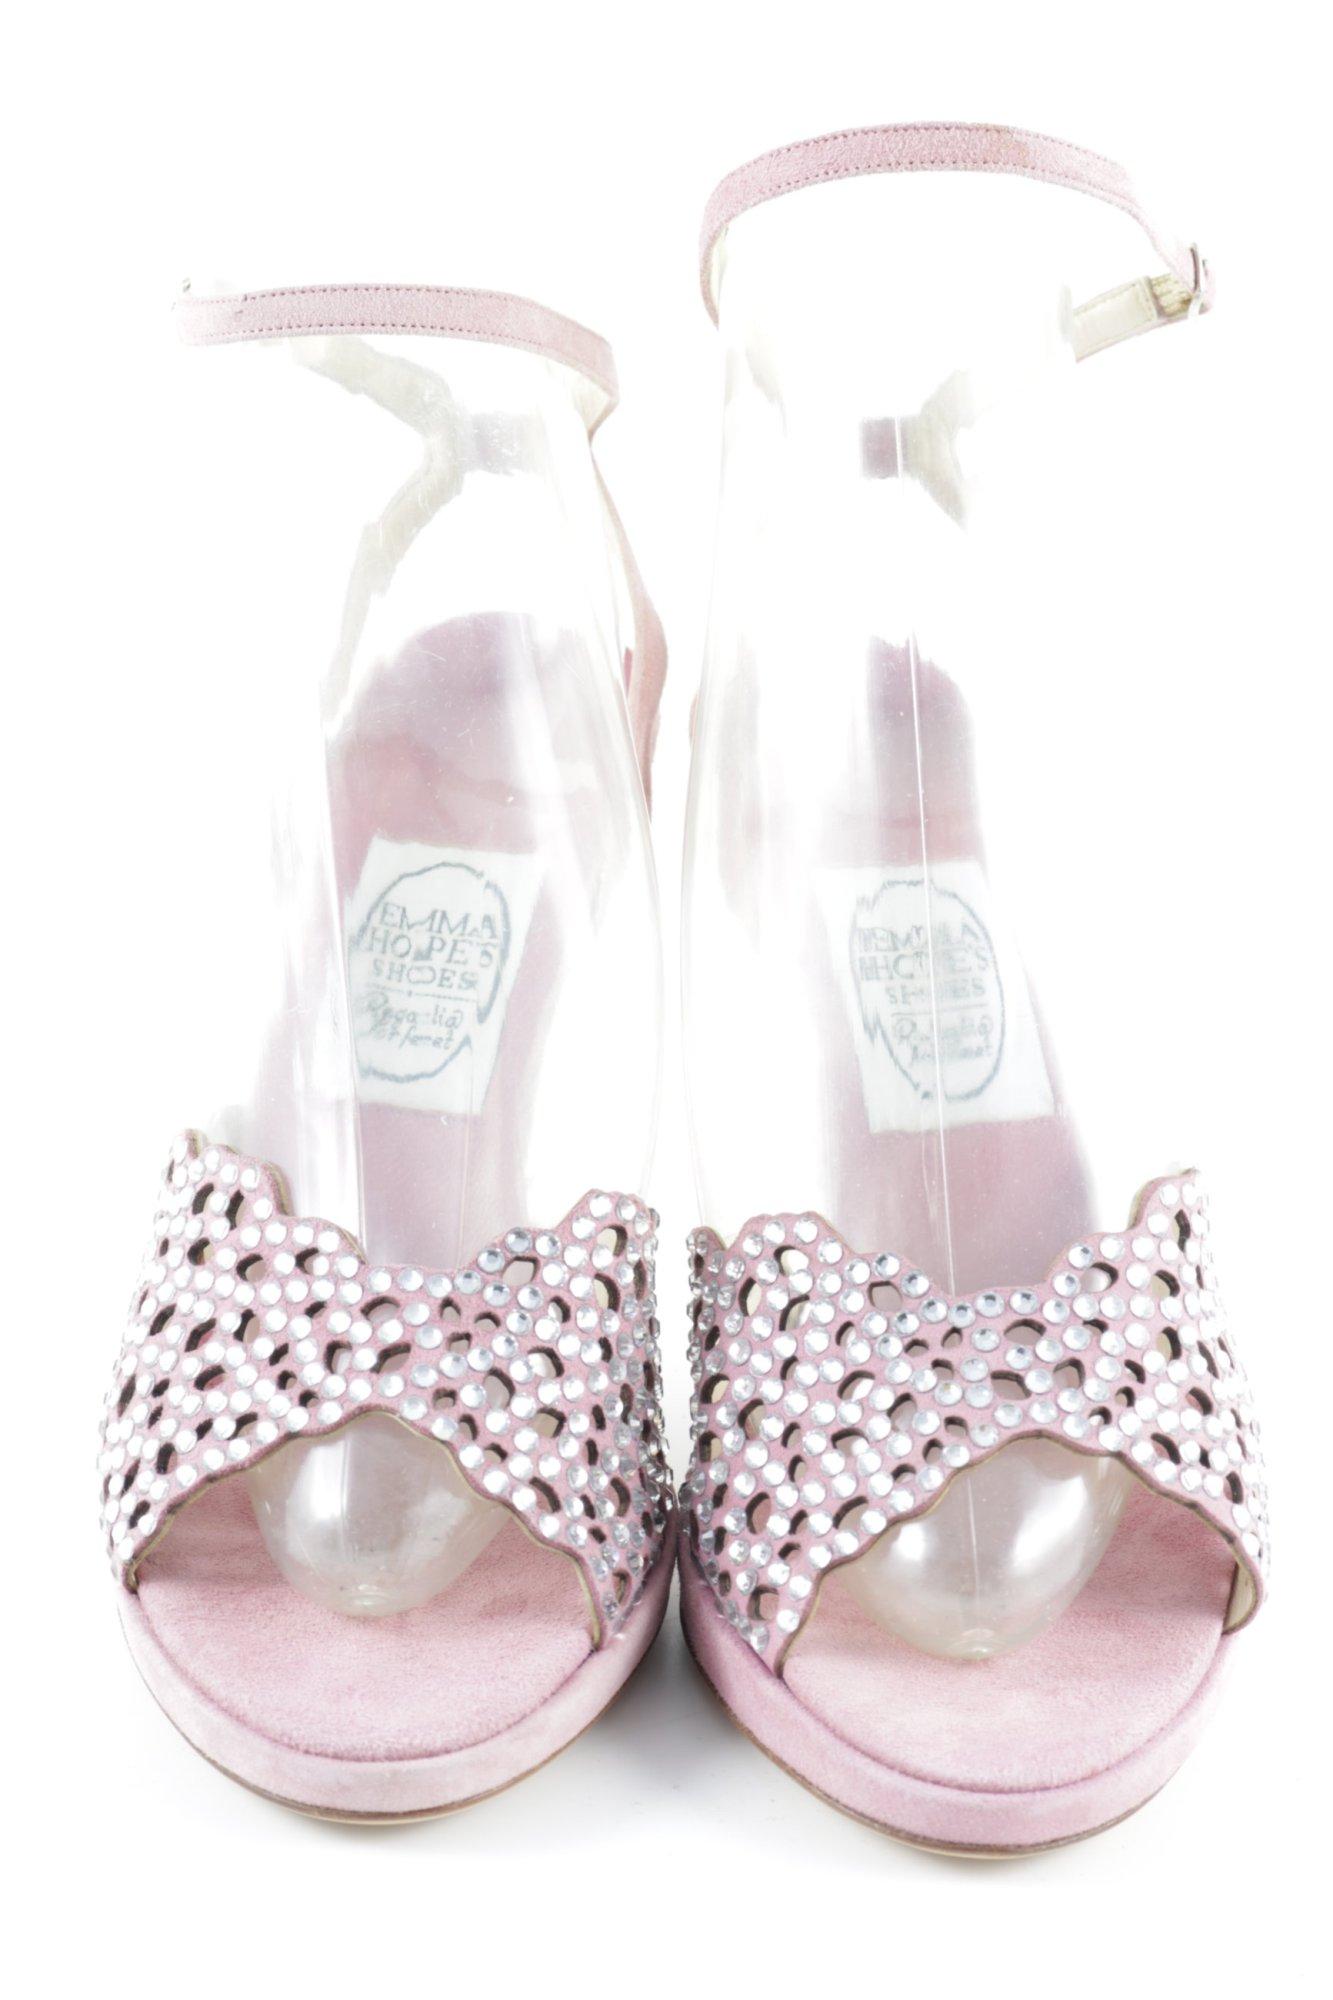 EMMA HOPE Tacco alto rosacrema motivo a pallini elegante Donna Taglia IT 40